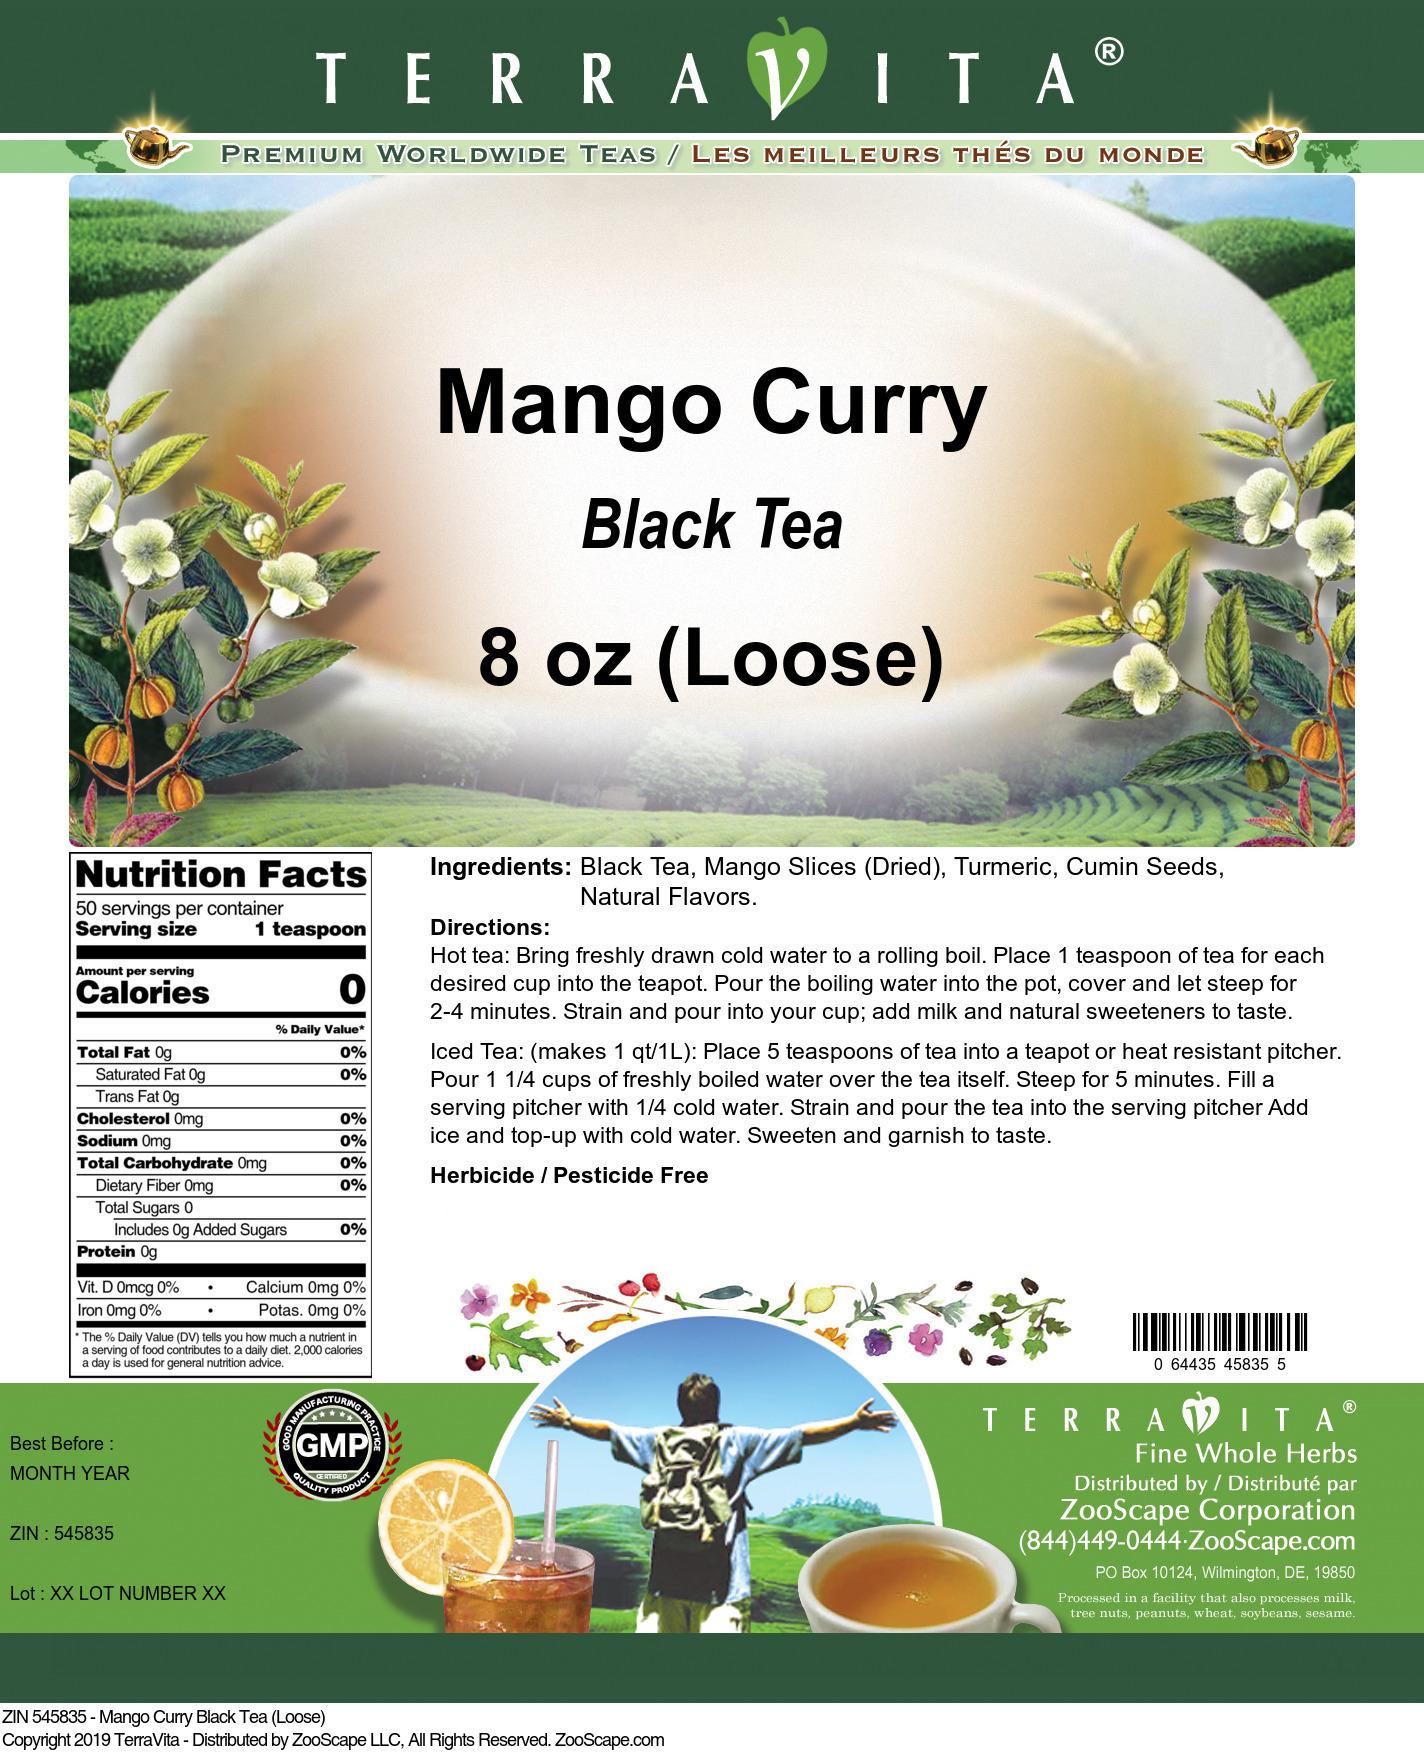 Mango Curry Black Tea